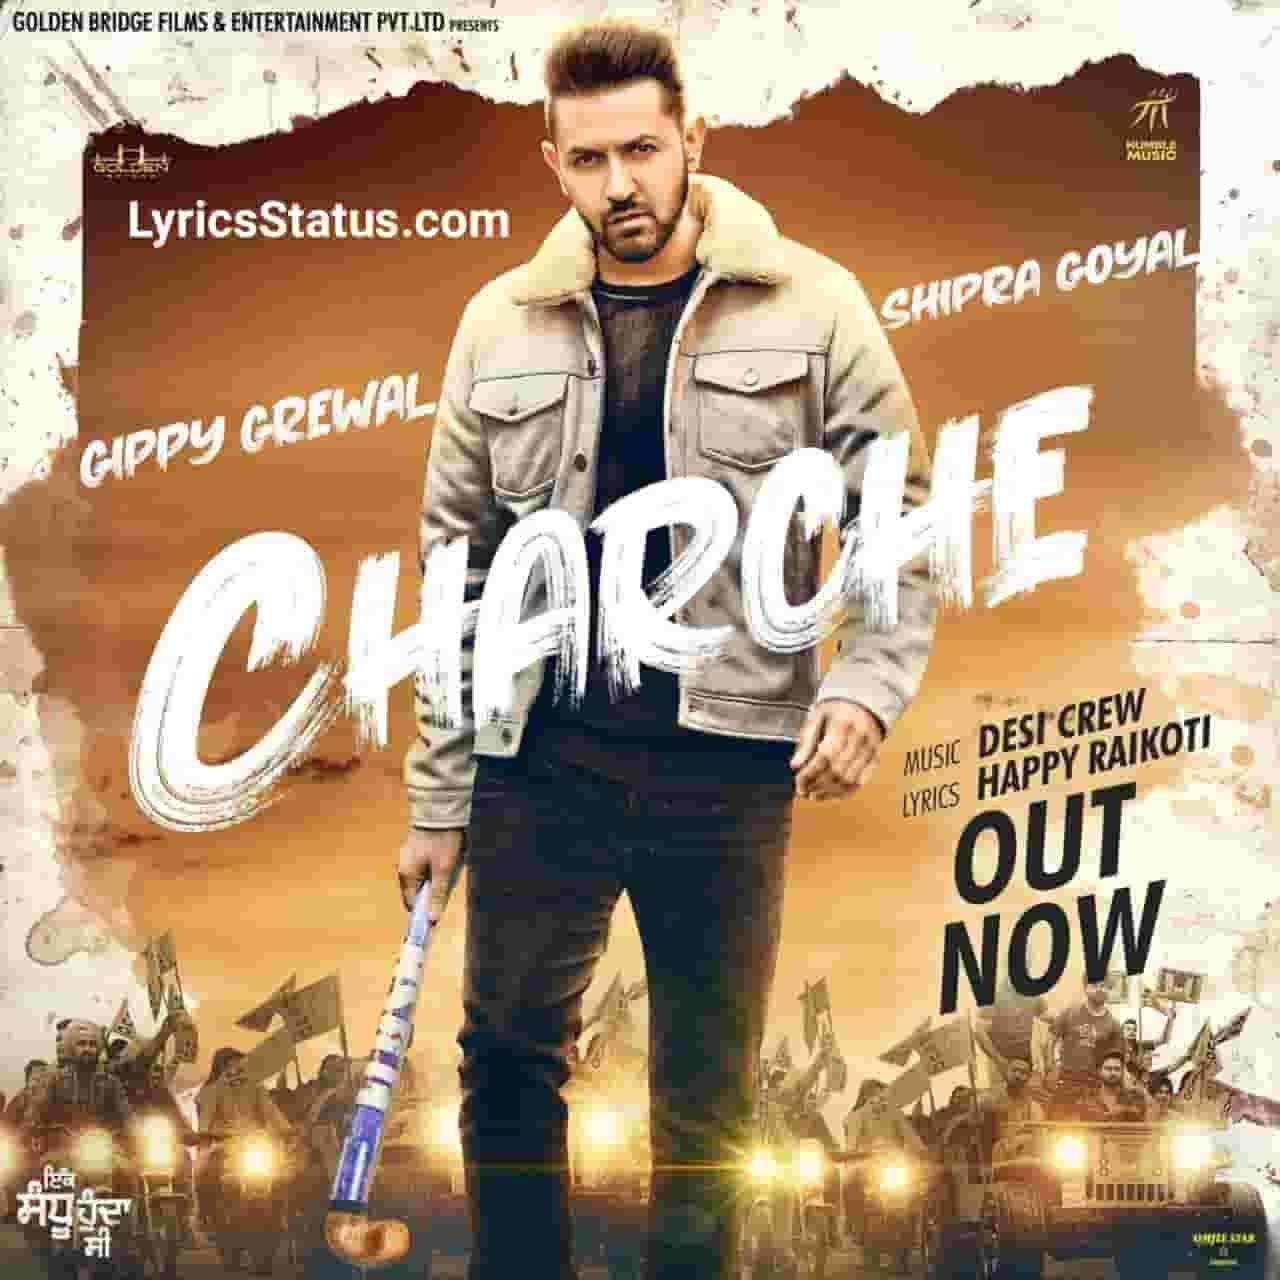 Charche Gippy Grewal Shipra Goyal Lyrics Status Download Video Latest punjabi song Zindagi jiyoni kive jatt nu pataLife tu likhayi badi thodi lagdi